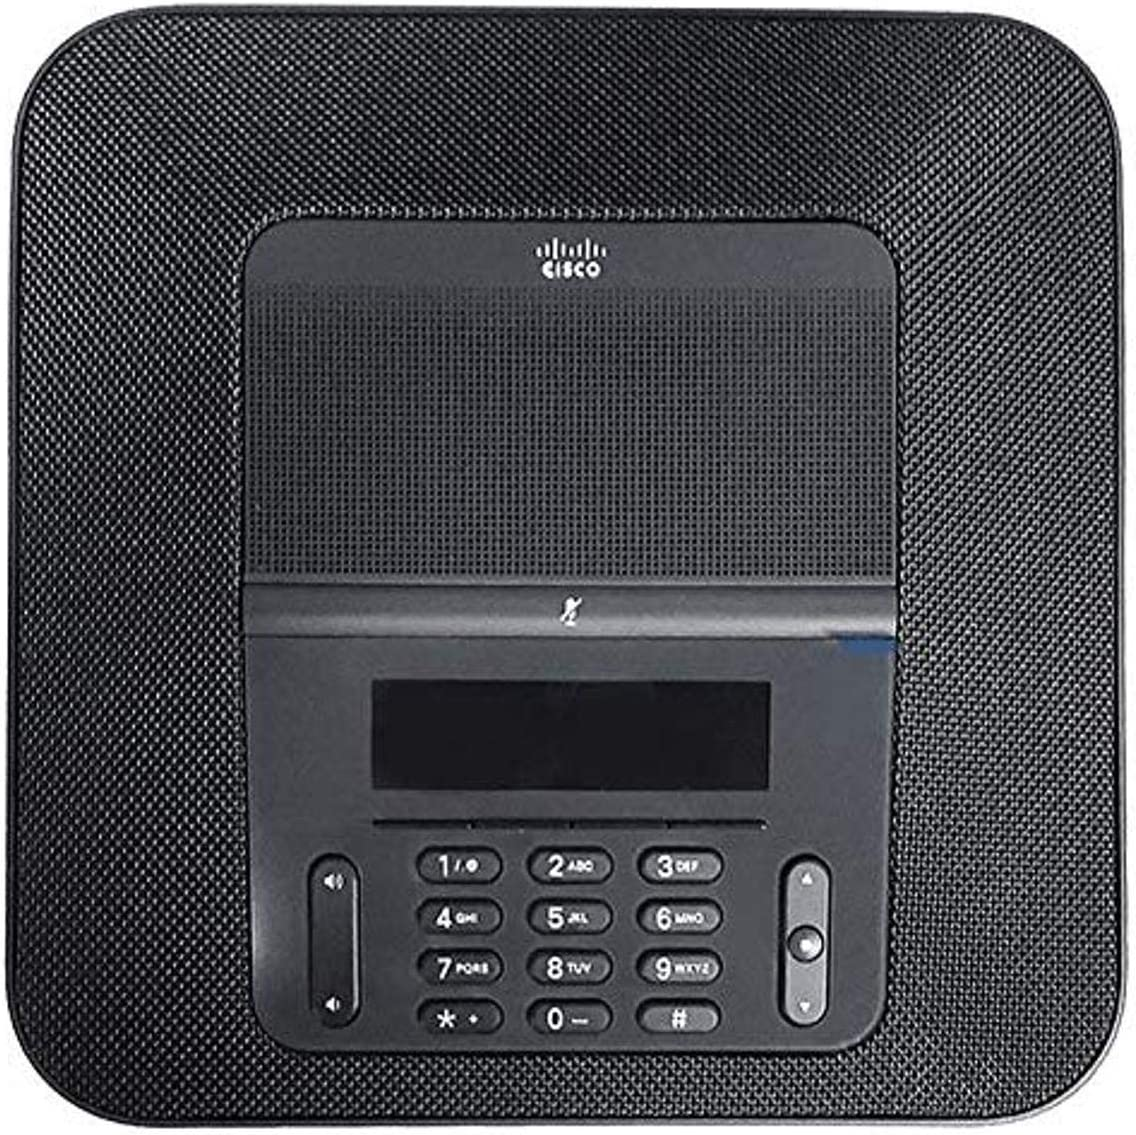 Cisco Cisco cp-8832-k9 IP Conference Phone, 2.6 Pound